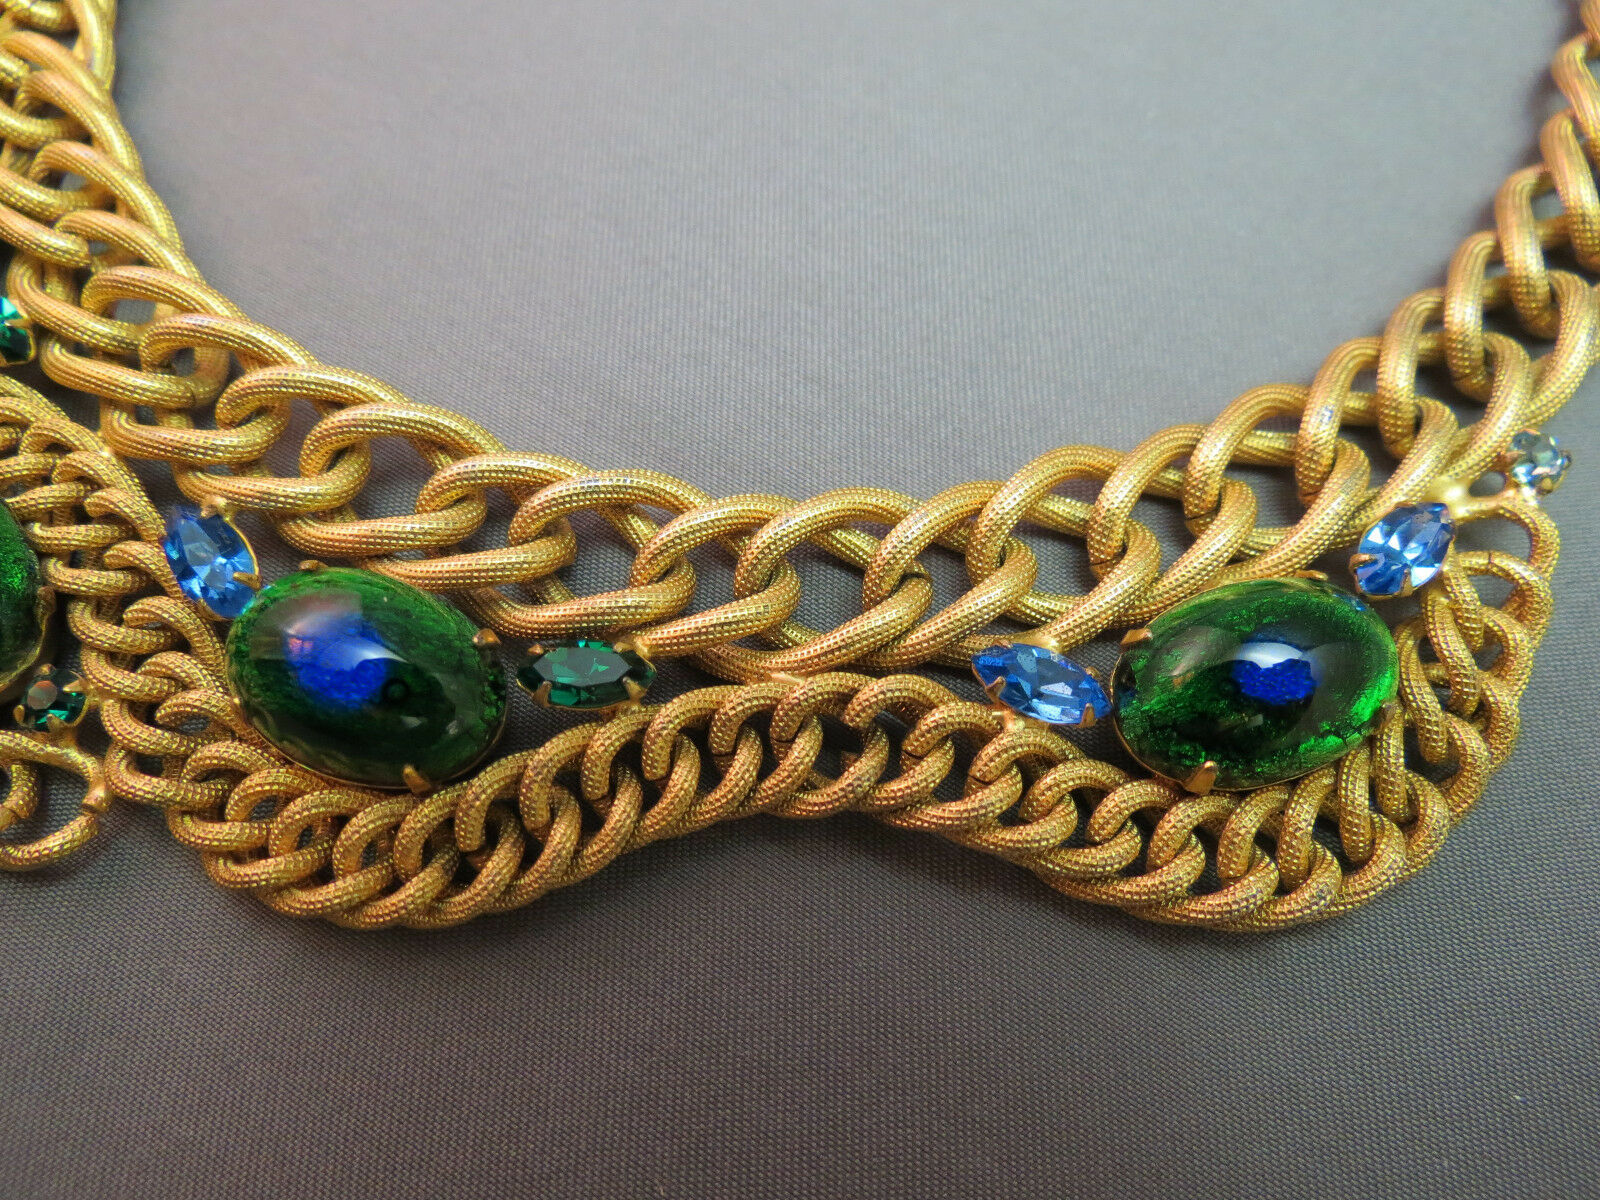 VTG Brania Bib Necklace Mimi Di N Collar Parue Blue Rhinestones Peacock Eye Cabs image 6